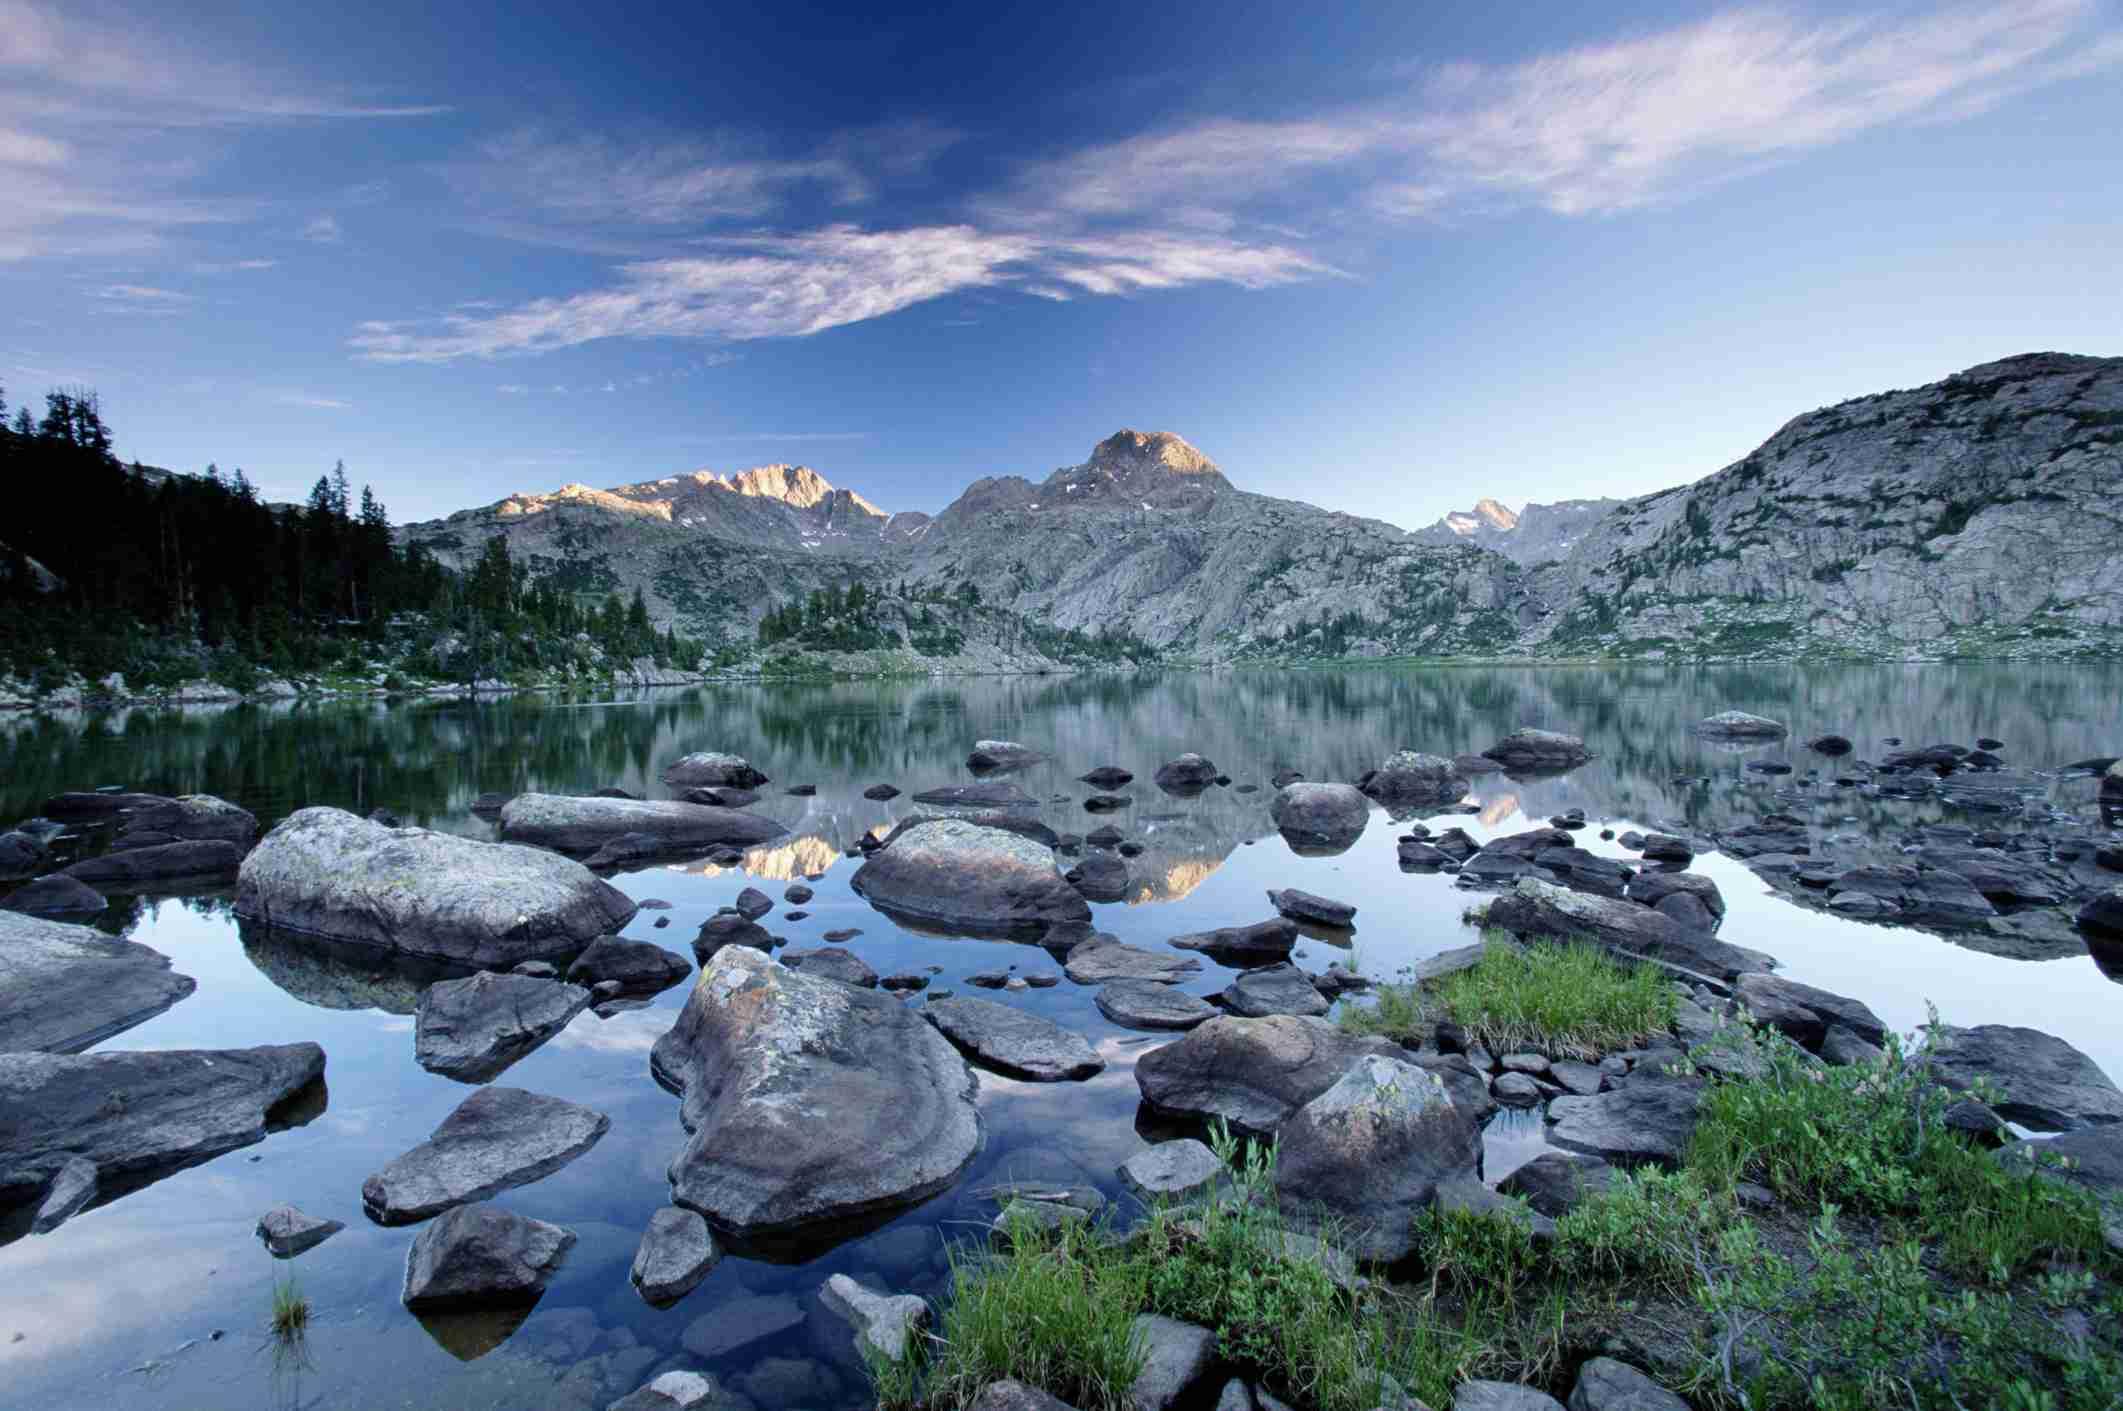 Bridger-Teton National Forest in Wyoming